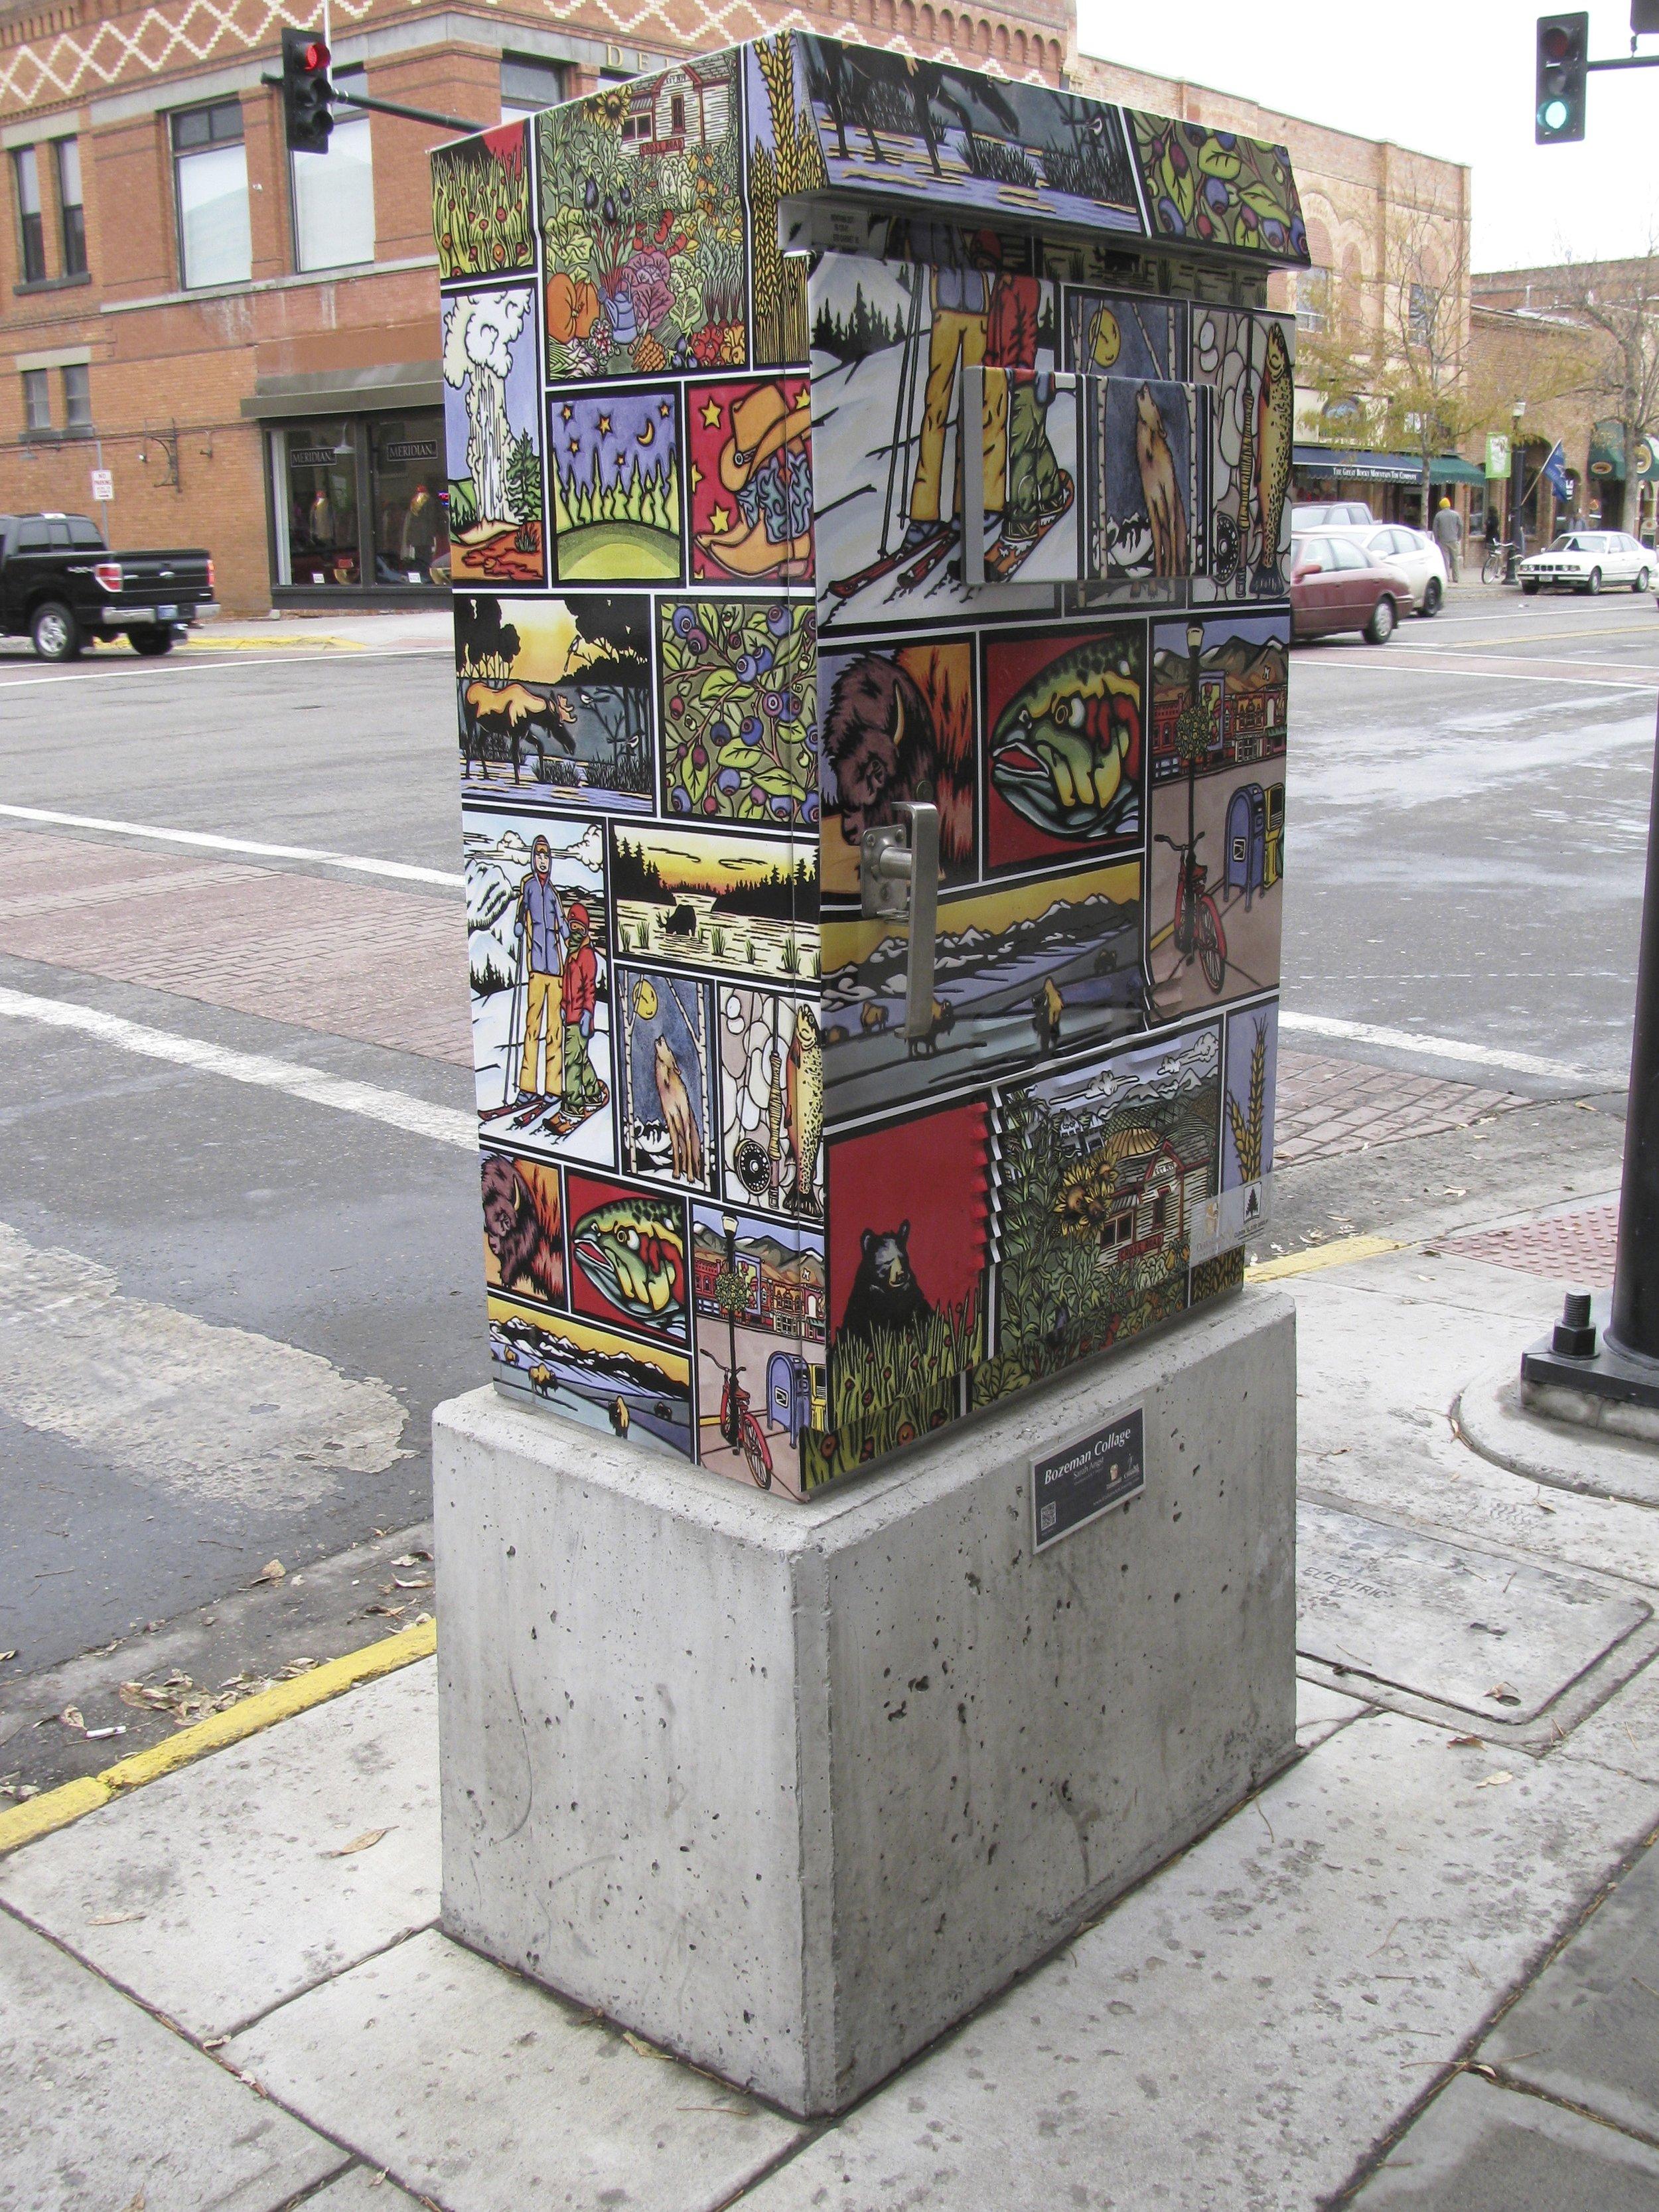 CleanSlateGroup_GraffitiResistant_Bozeman,MT_TrafficSignalBoxes_PhaseOneDowntown_Main&Black_3.jpg